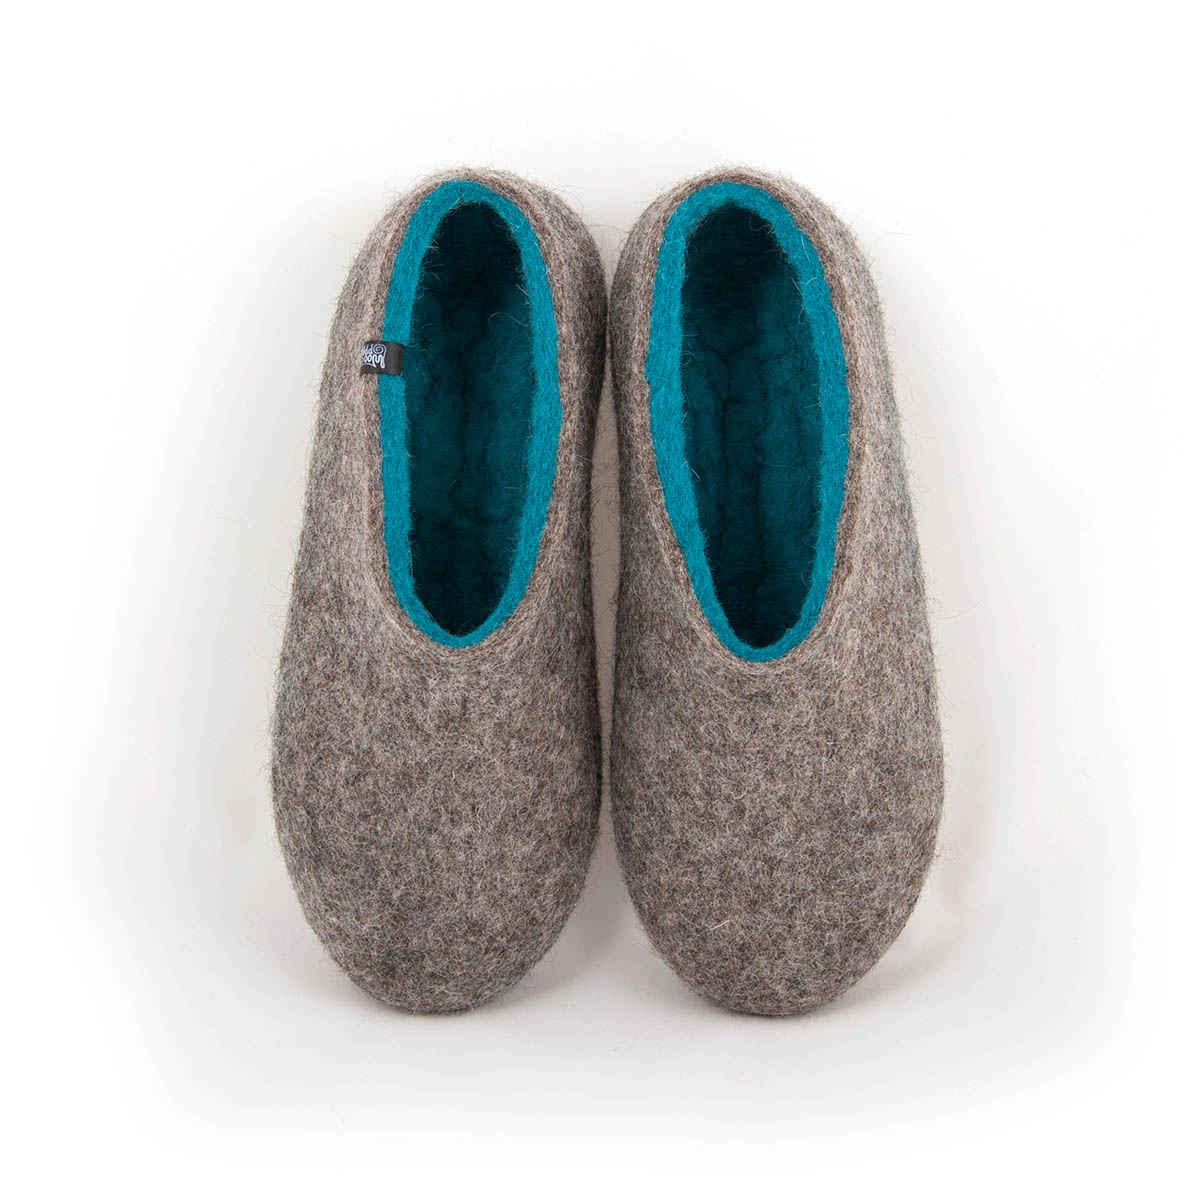 Womens felt slippers DUAL NATURAL gray blue azure